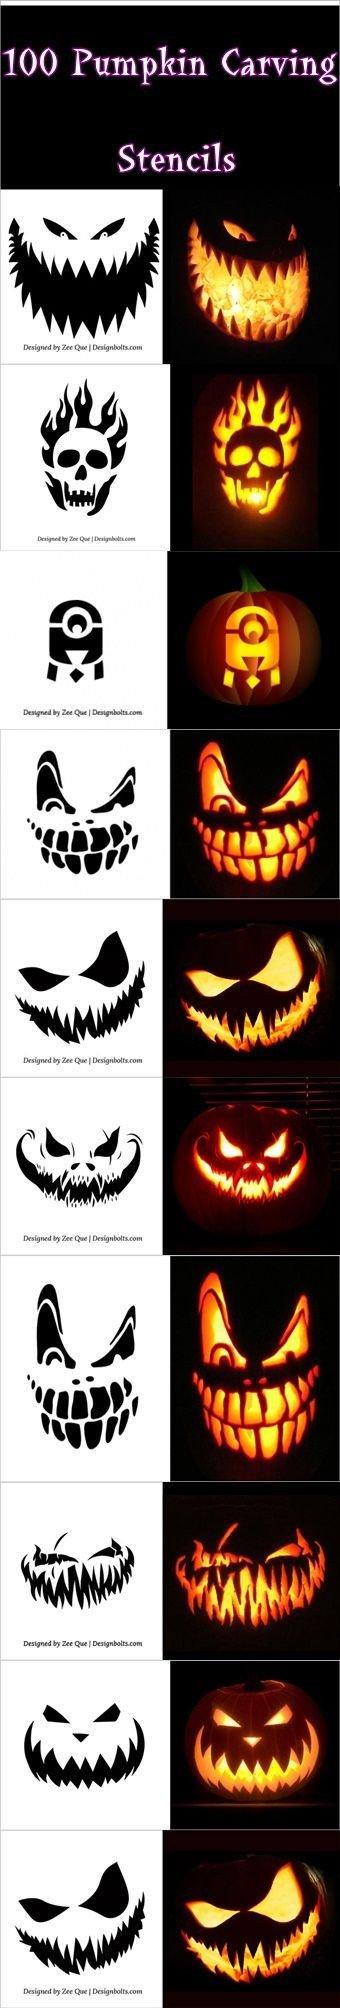 Ucf Pumpkin Stencil 100 Pumpkin Carving Stencils Pumpkin Carving Stencils